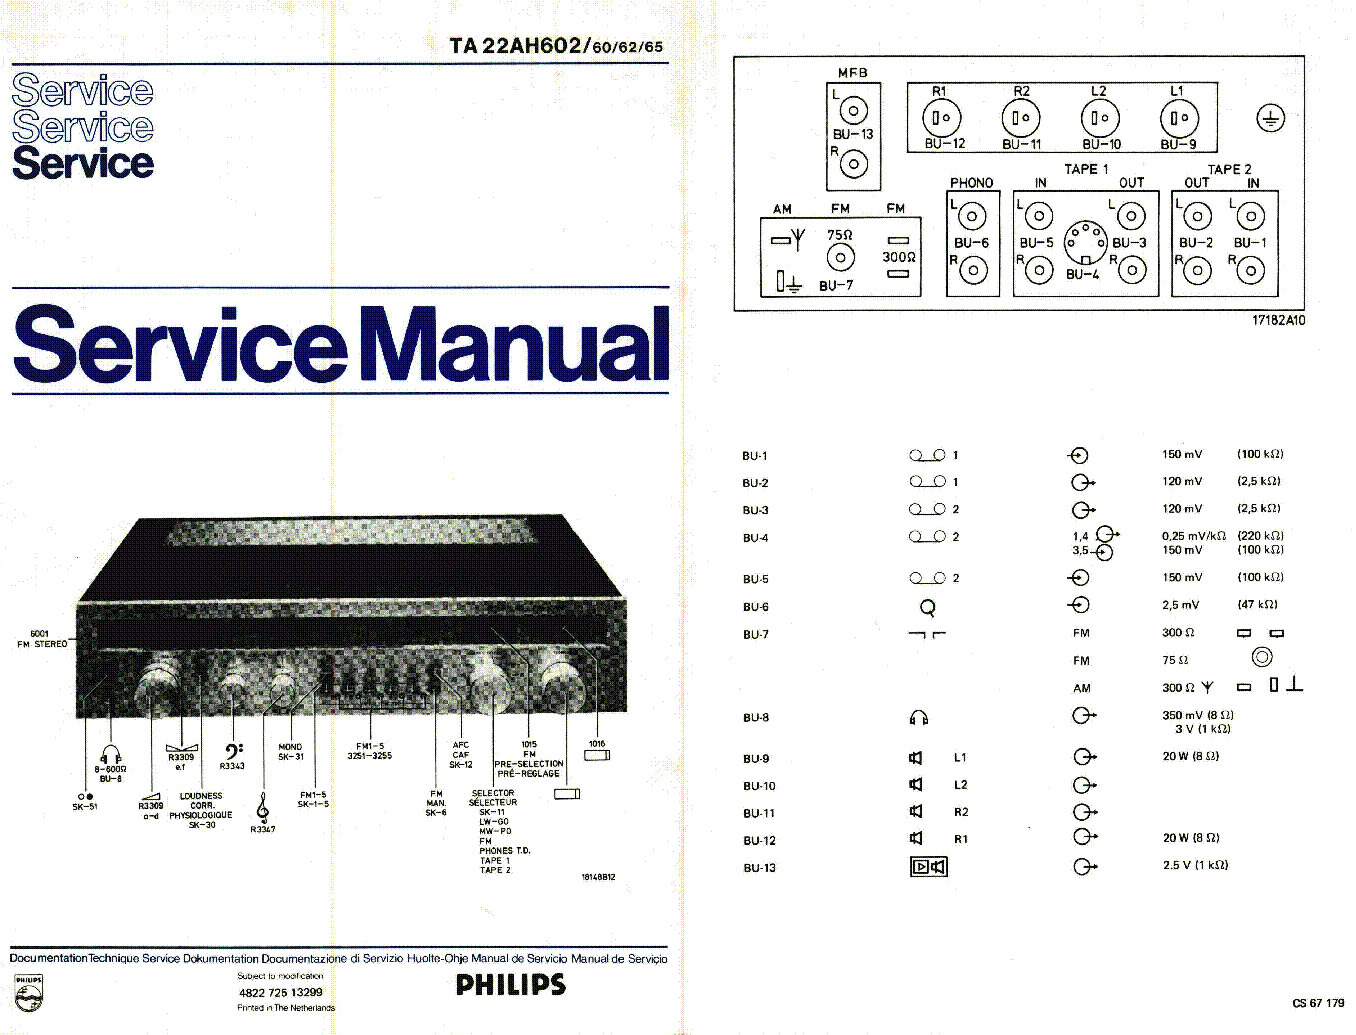 Philips Mcm704d Service Manual Free Download Schematics